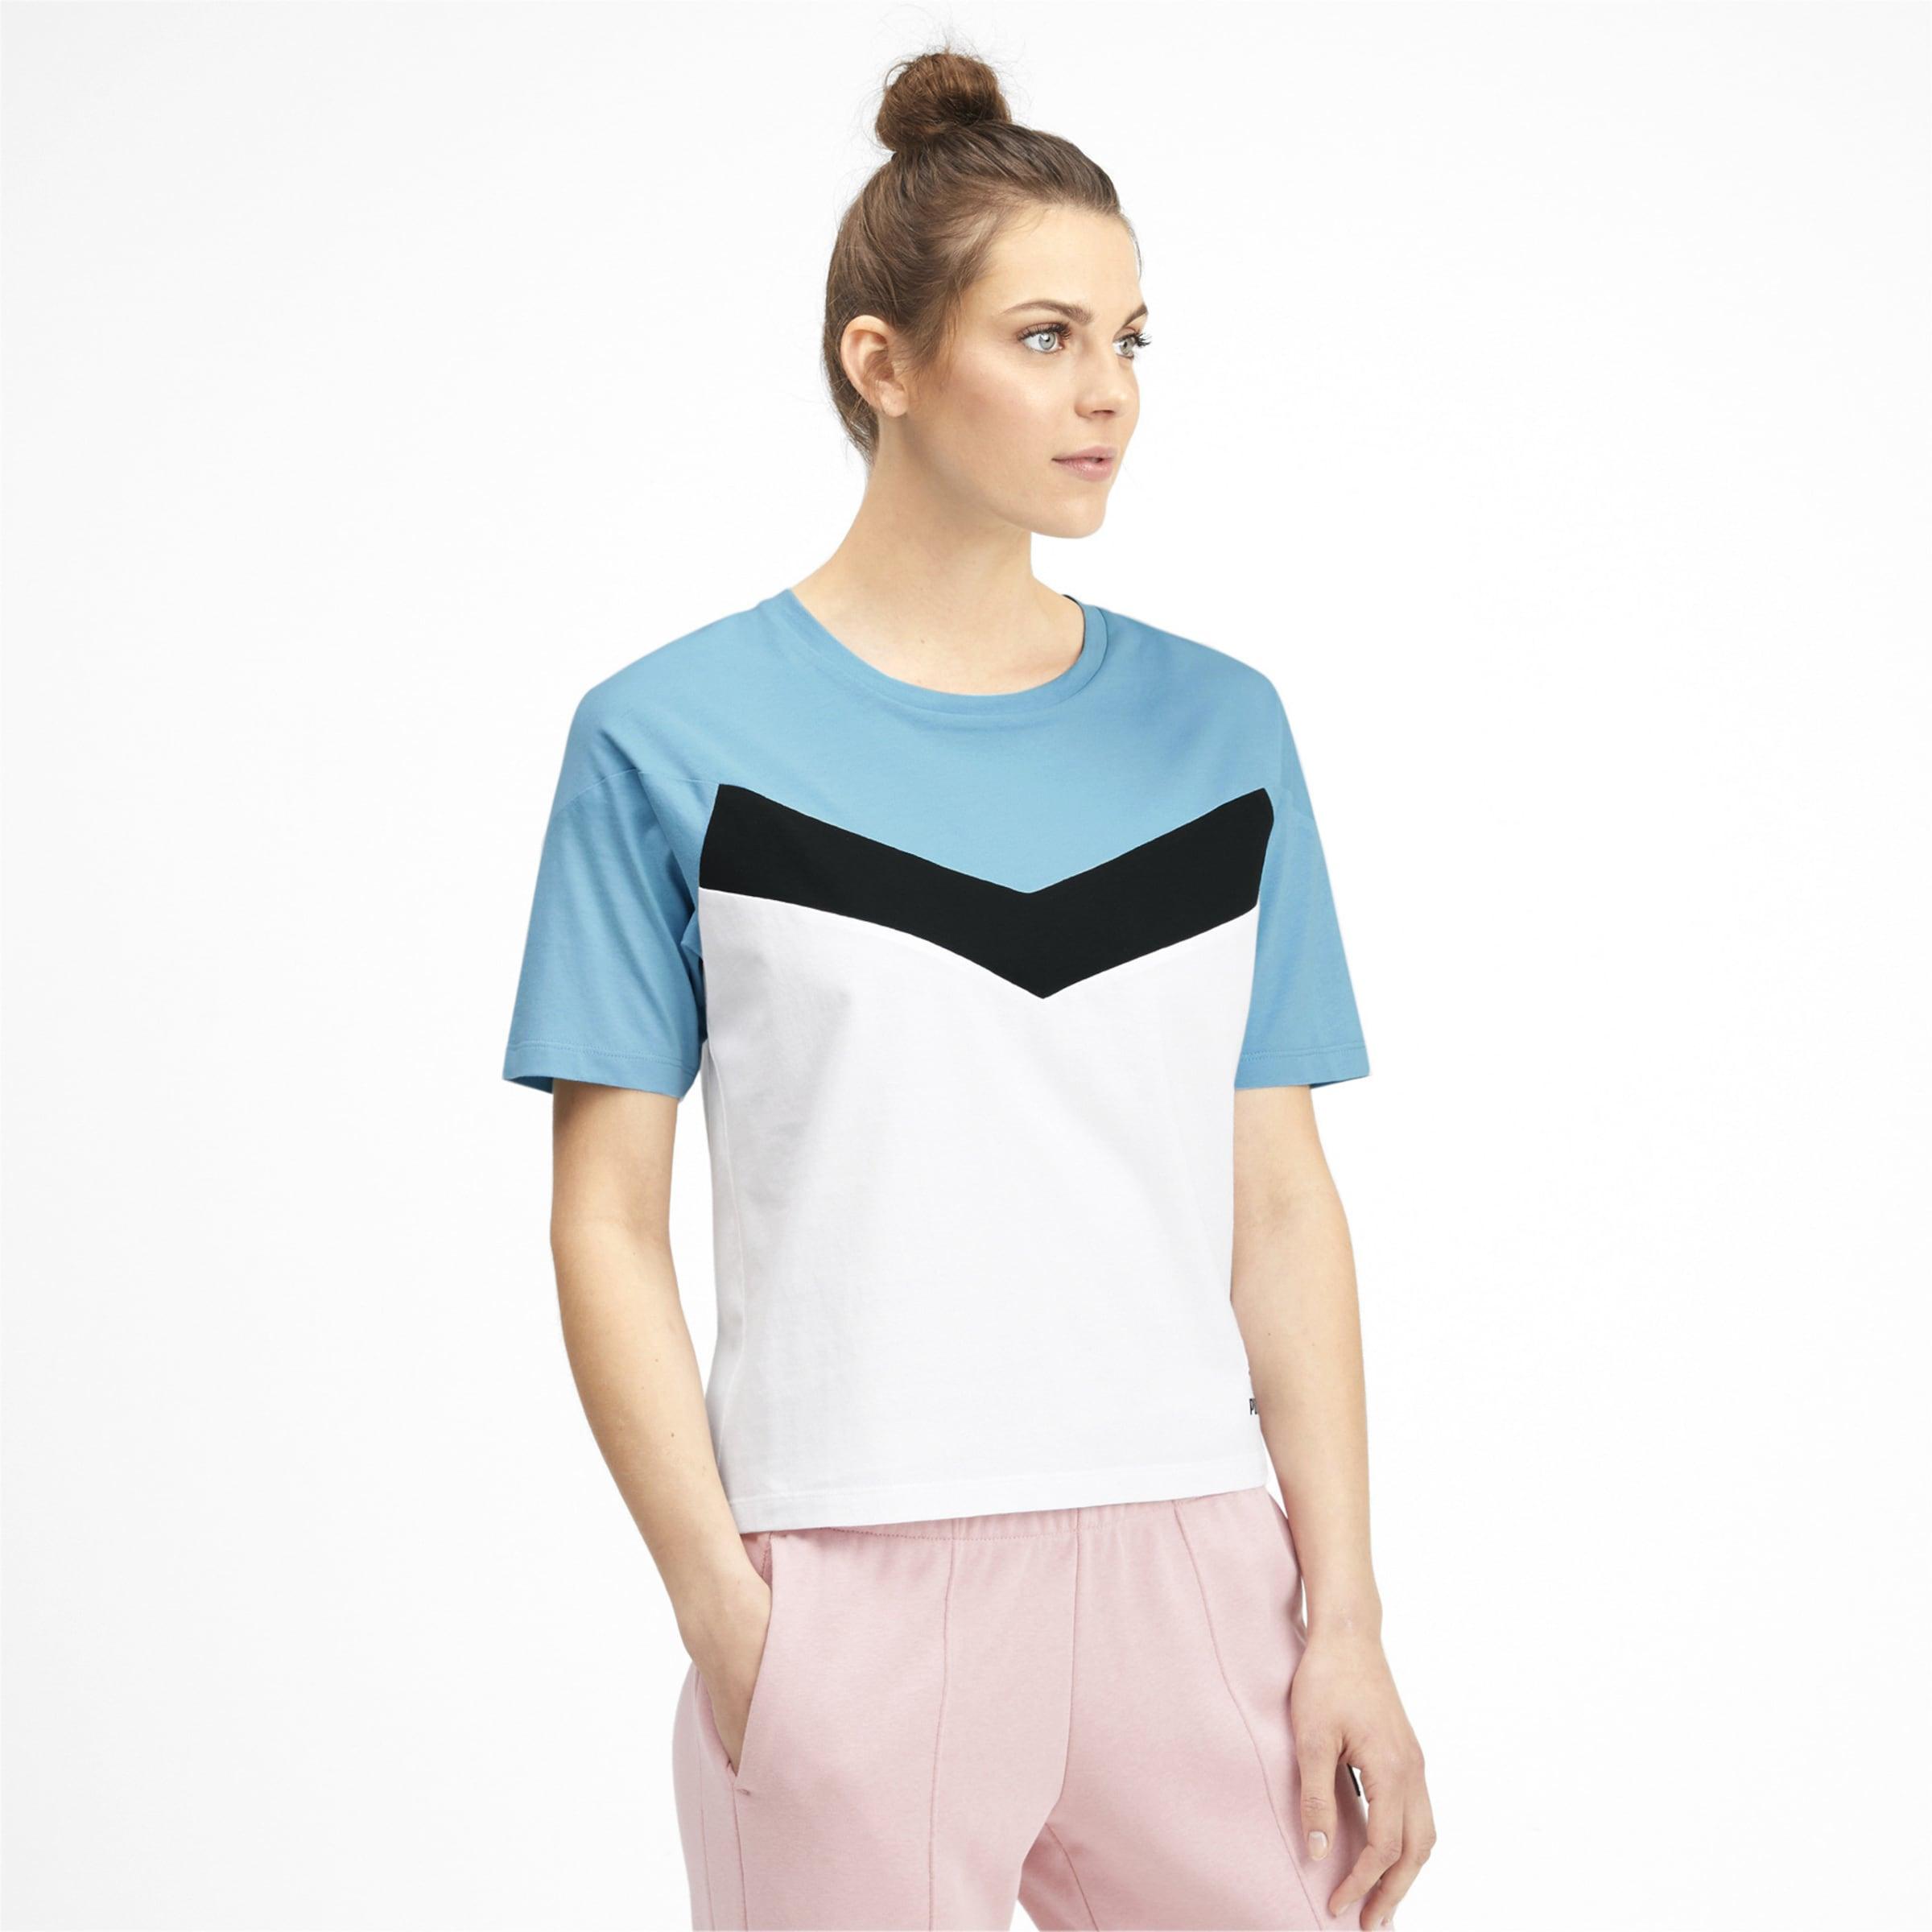 In shirt RauchblauSchwarz Puma T Weiß dthQCsr